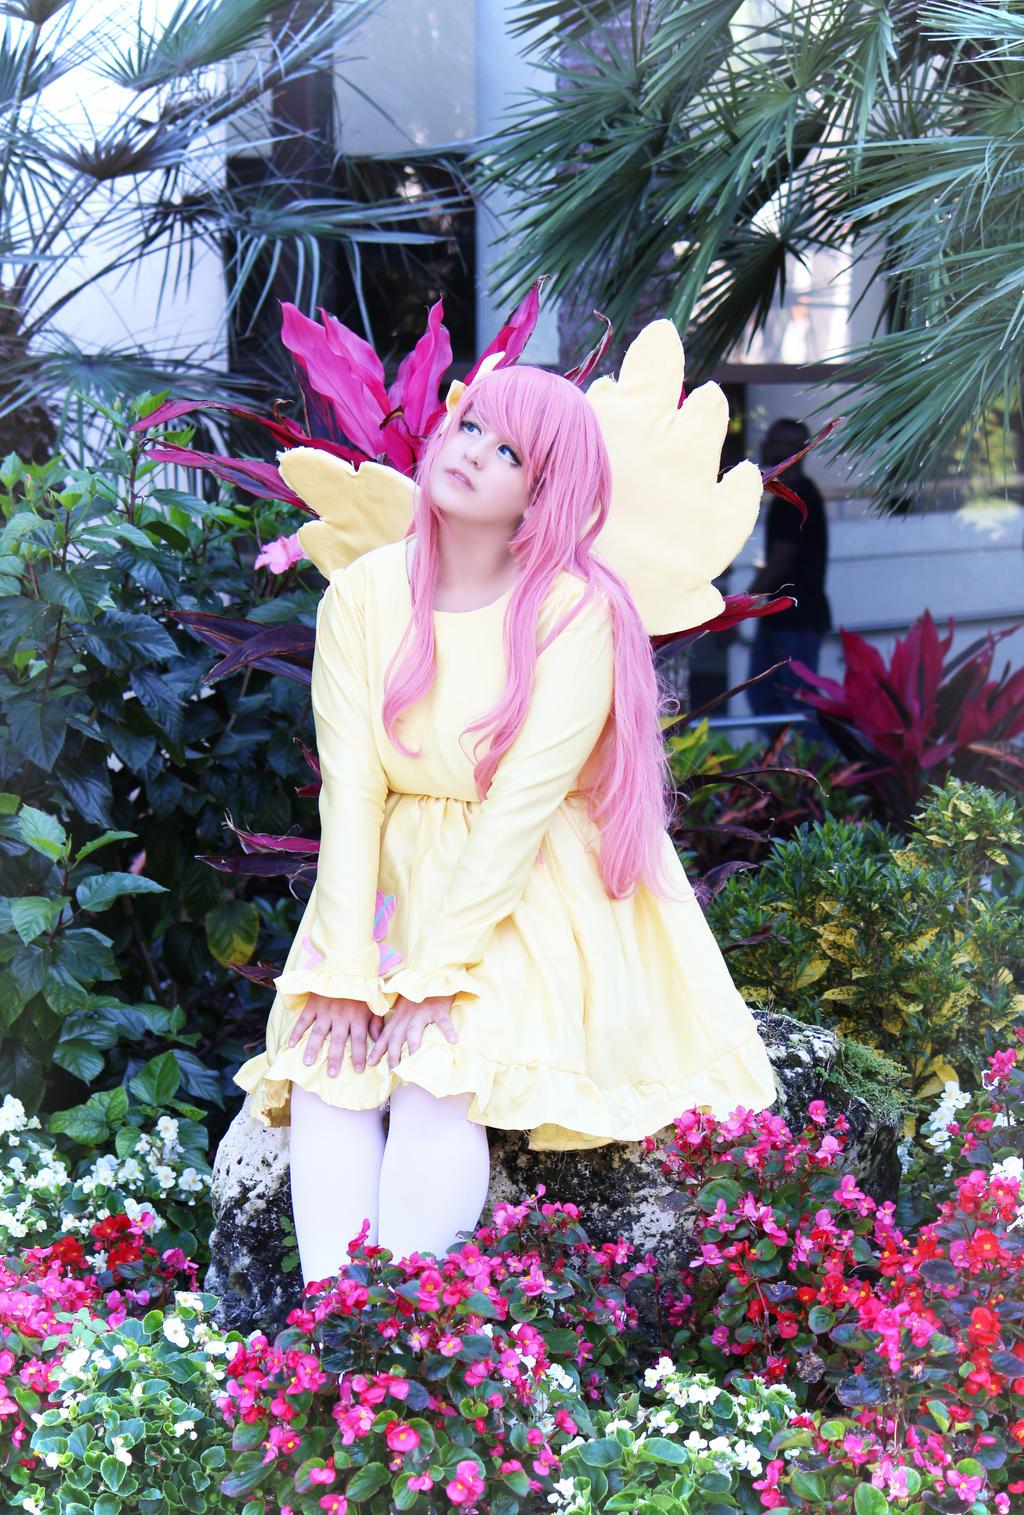 My Secret Garden: Fluttershy: My Secret Garden By II2DII On DeviantArt